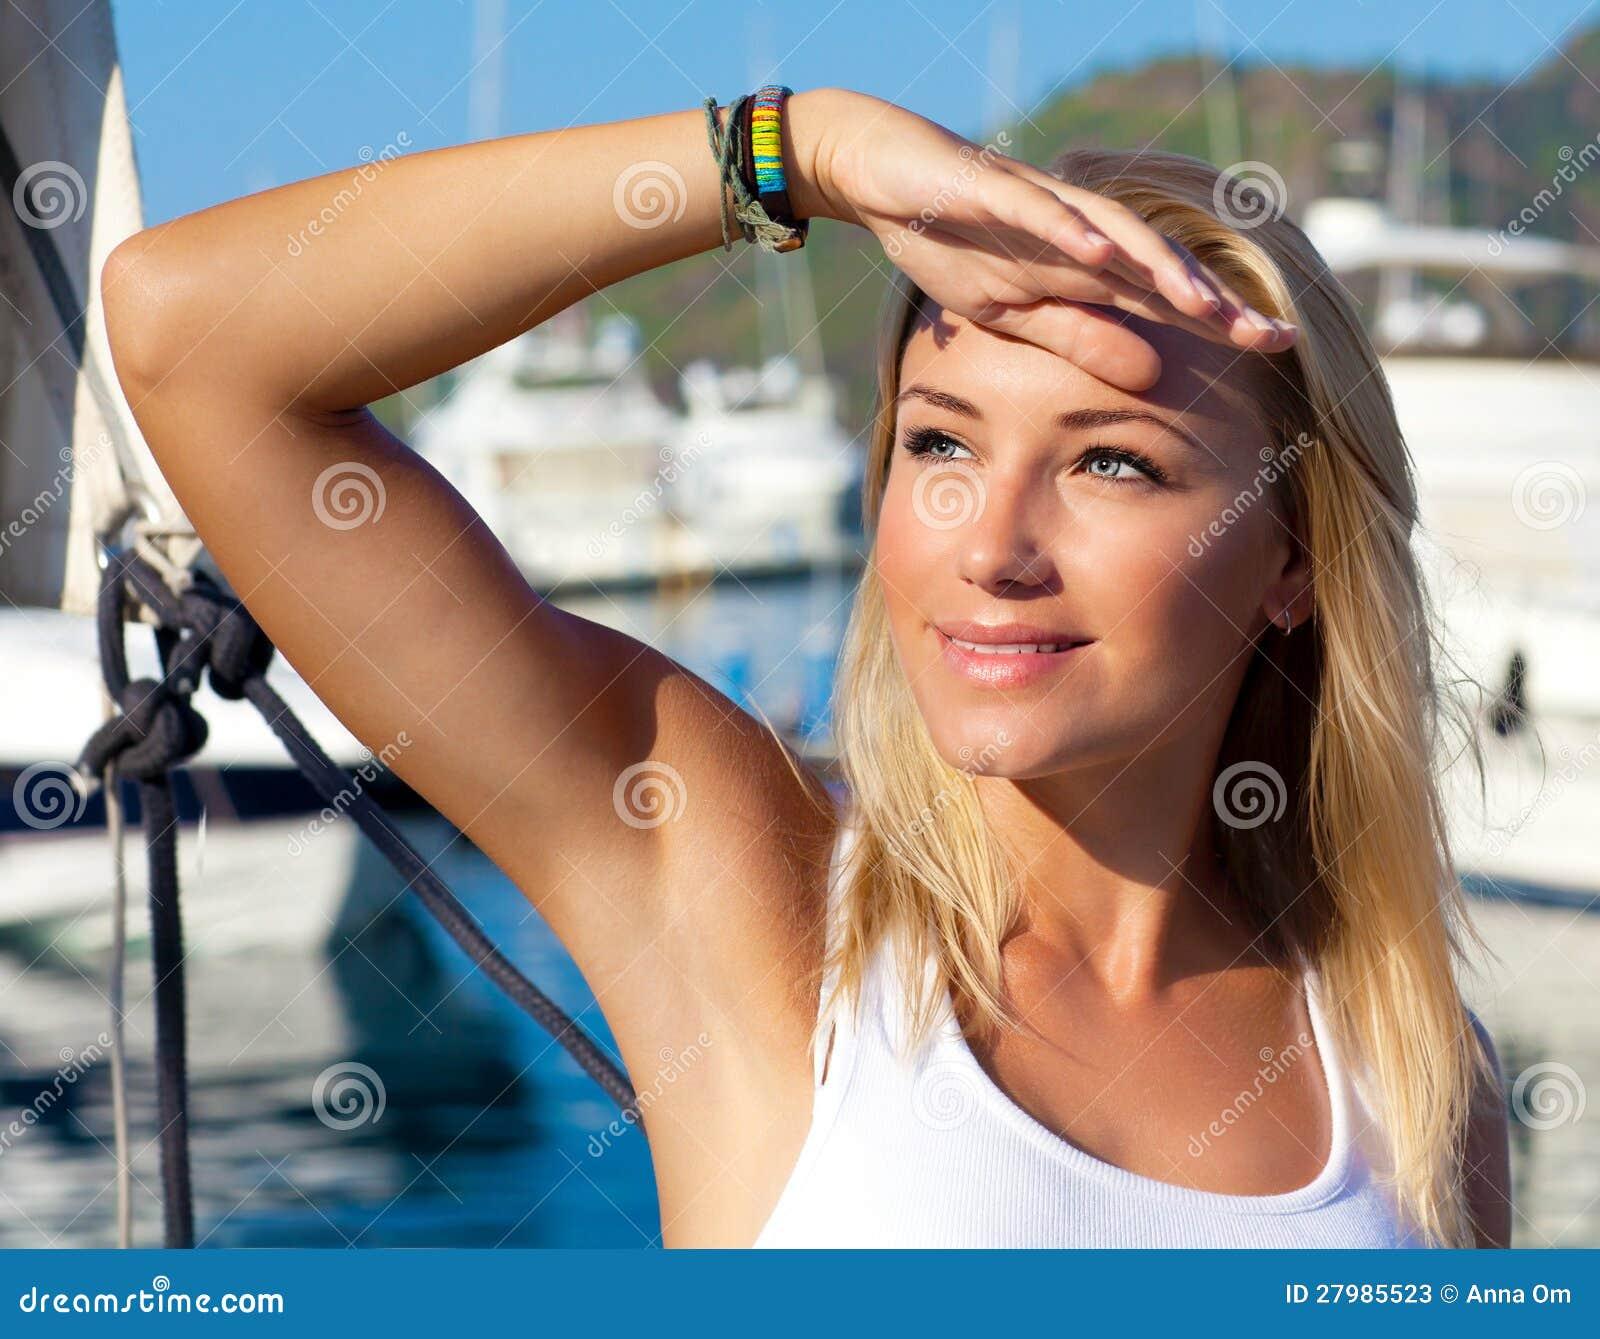 Bikini Girls Fishing Boat Playboy Playmates My Private